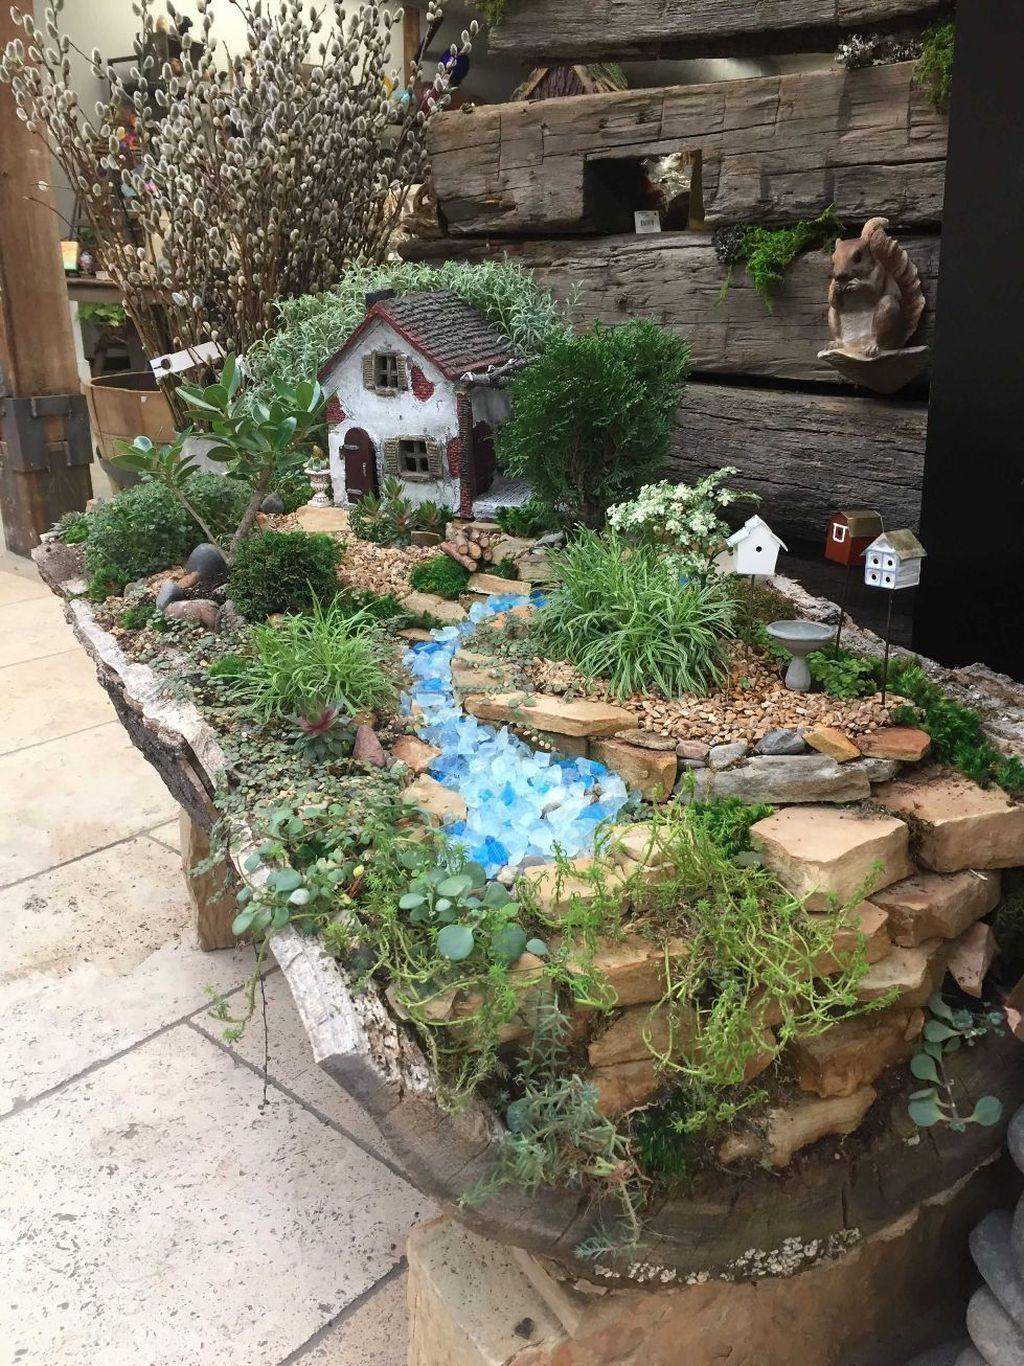 Unordinary Magical Fairy Garden Design Ideas To Try 26